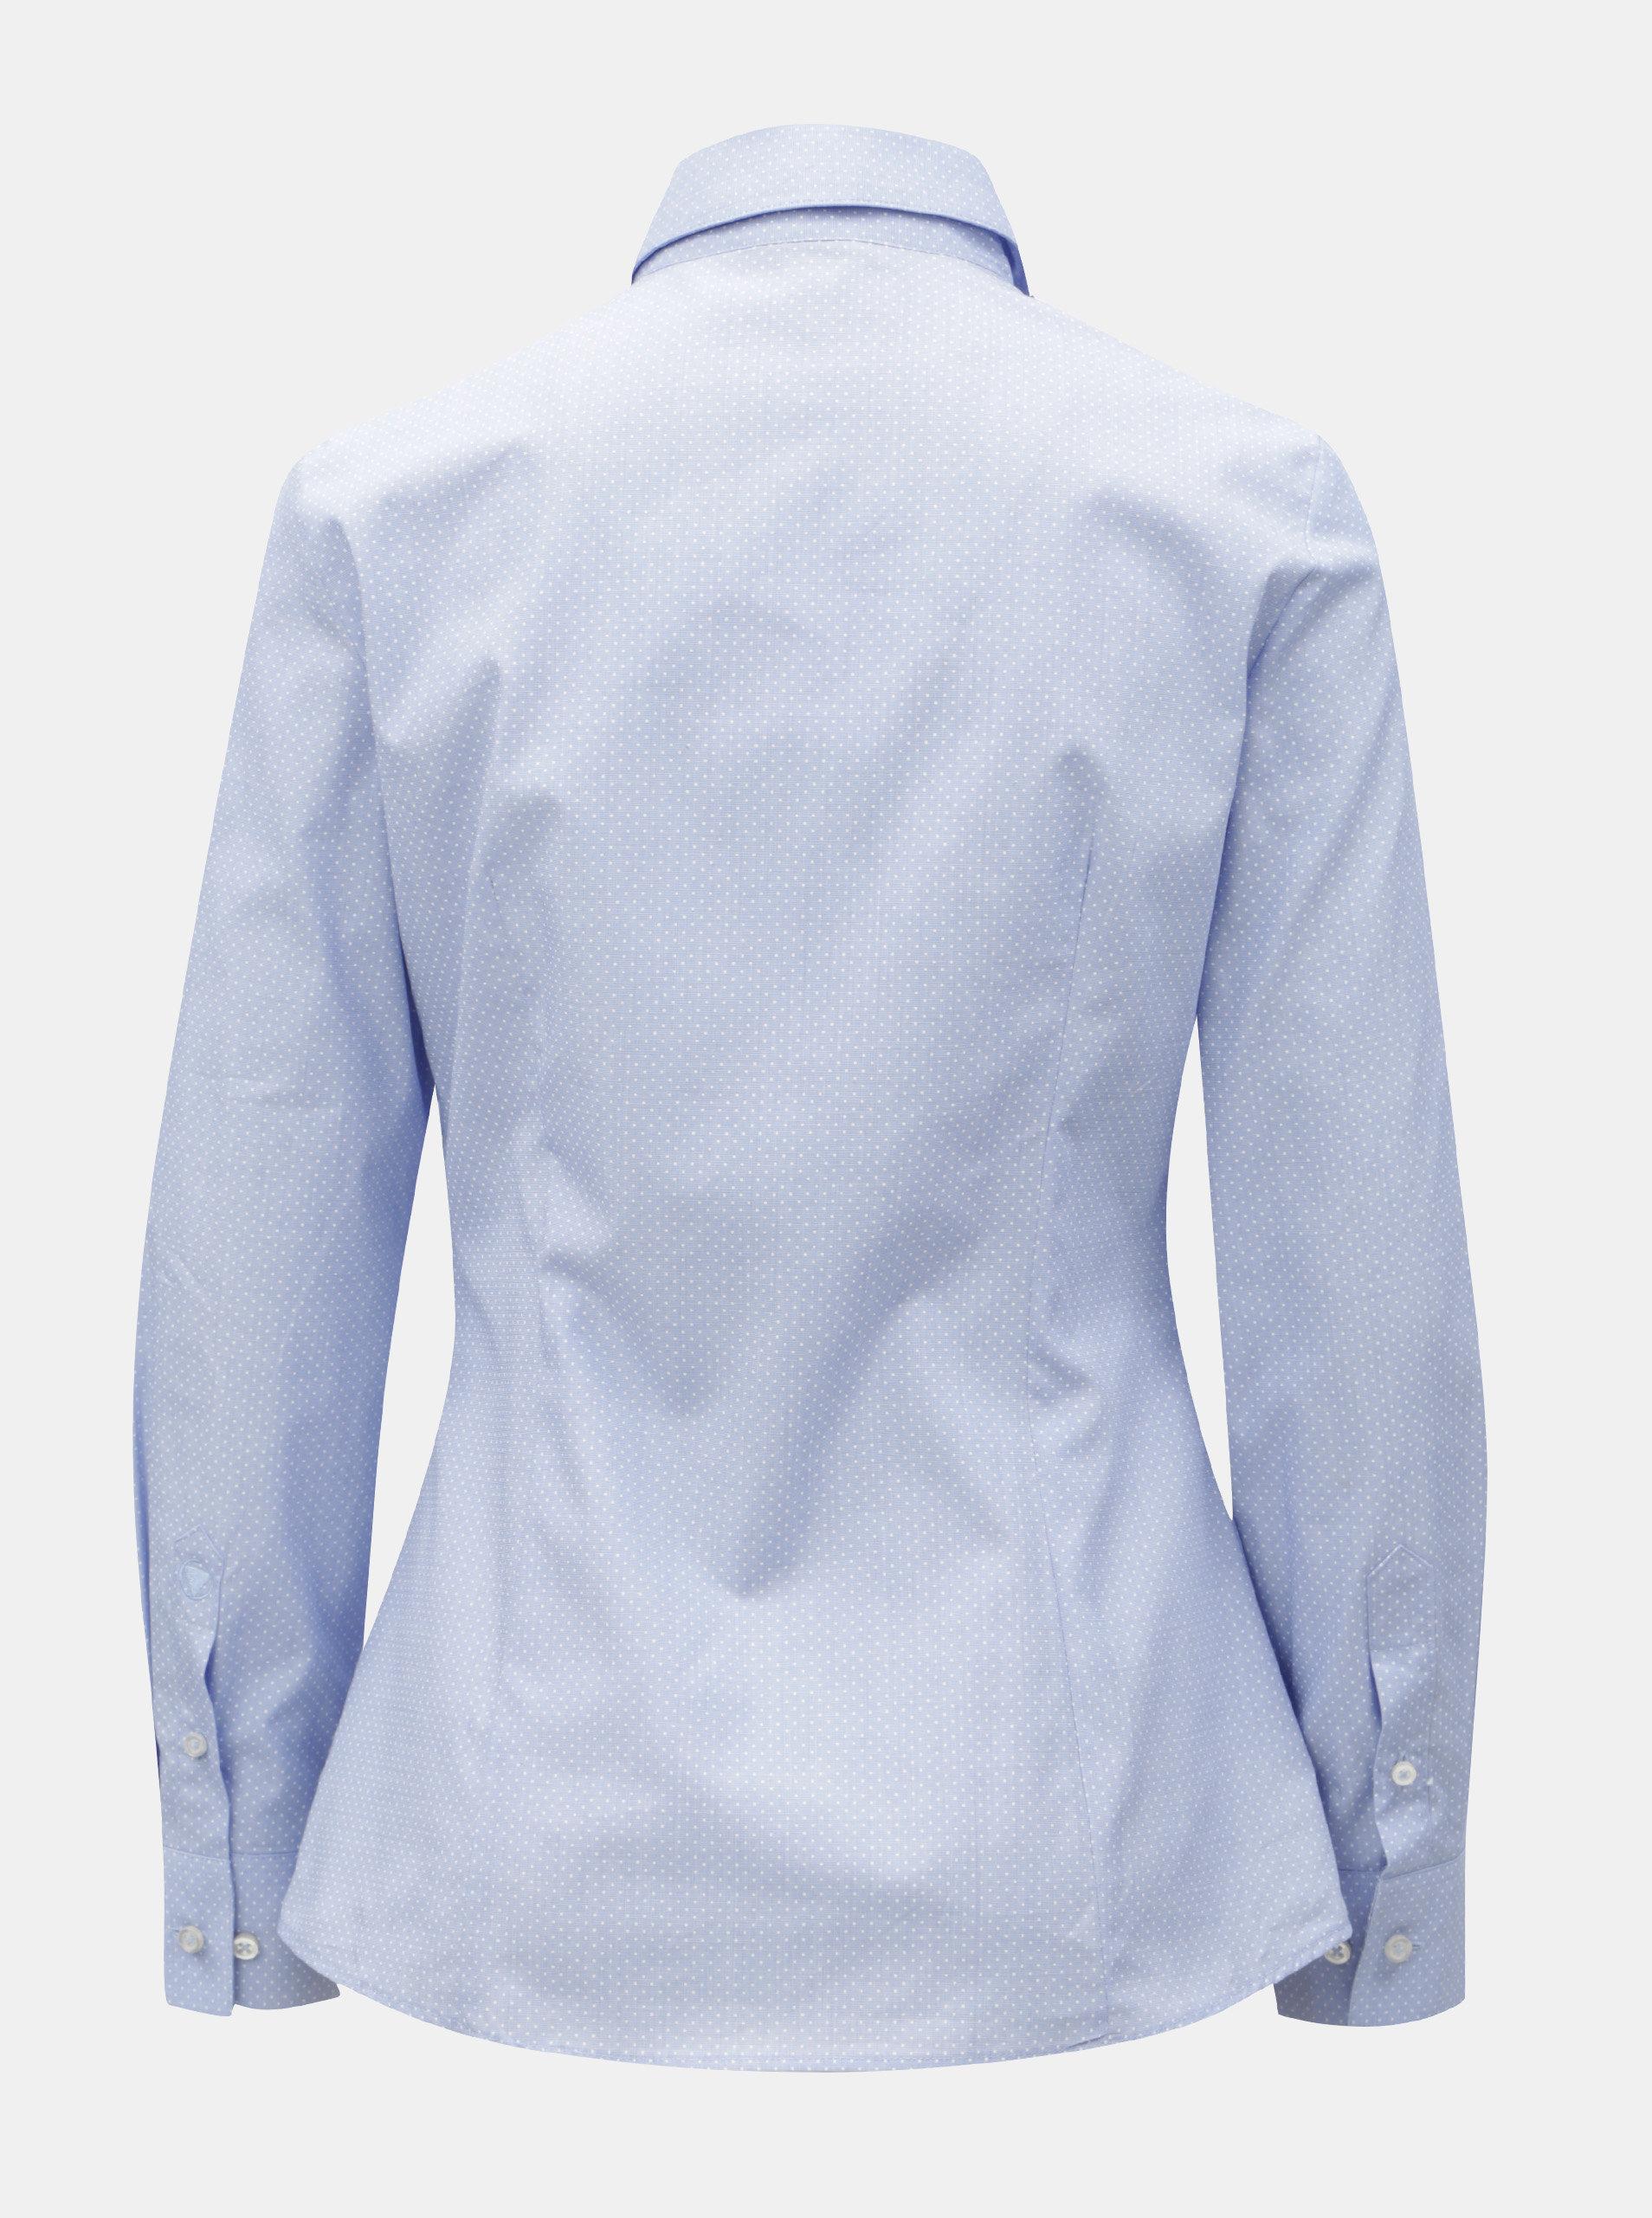 0aa16639d0a2 Svetlomodrá dámska bodkovaná košeľa VAVI ...